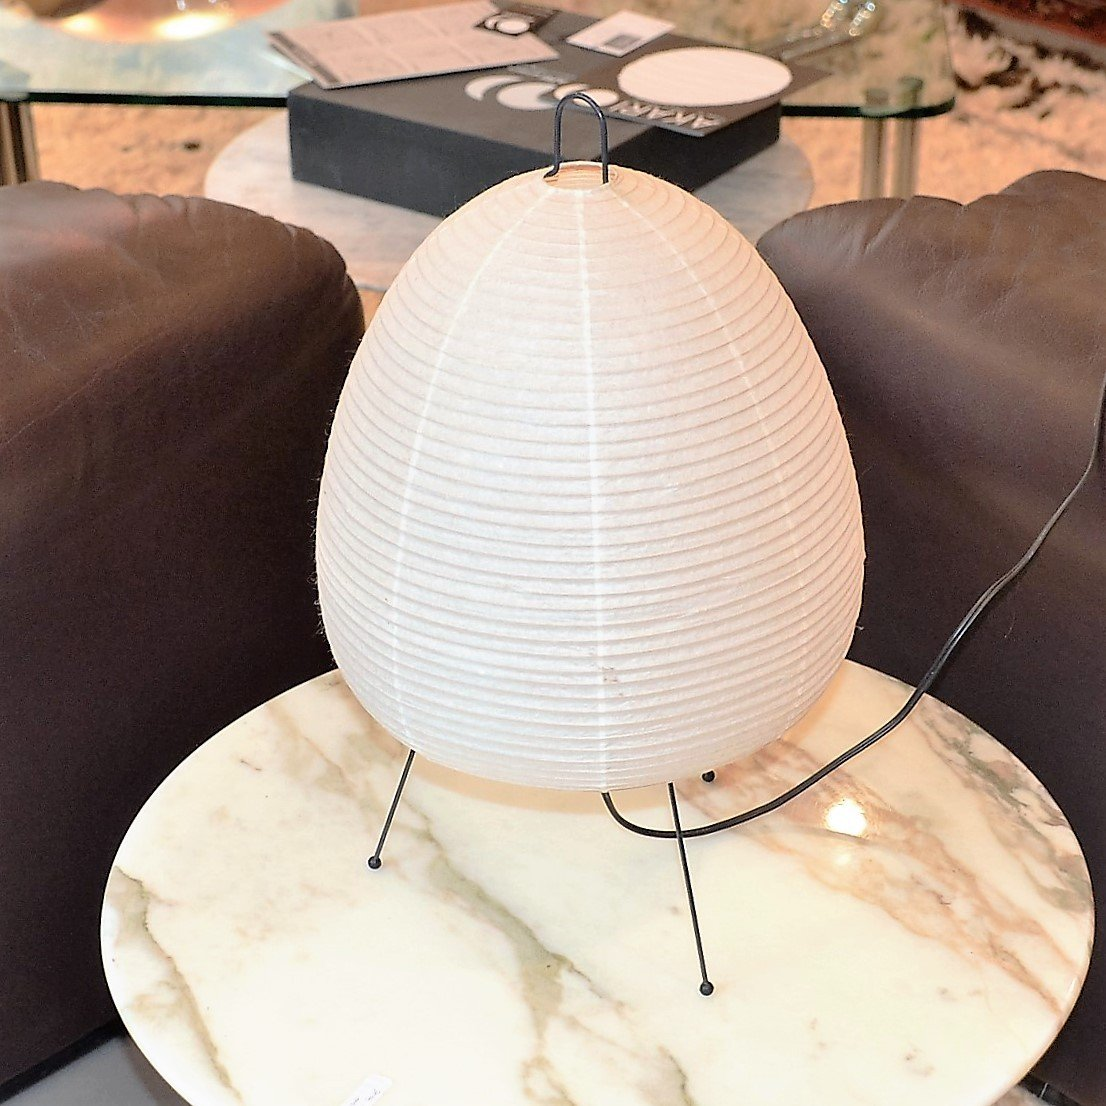 Vintage japanese akari 1a table lamp by isamu noguchi for ozeki co for - Isamu noguchi table basse ...